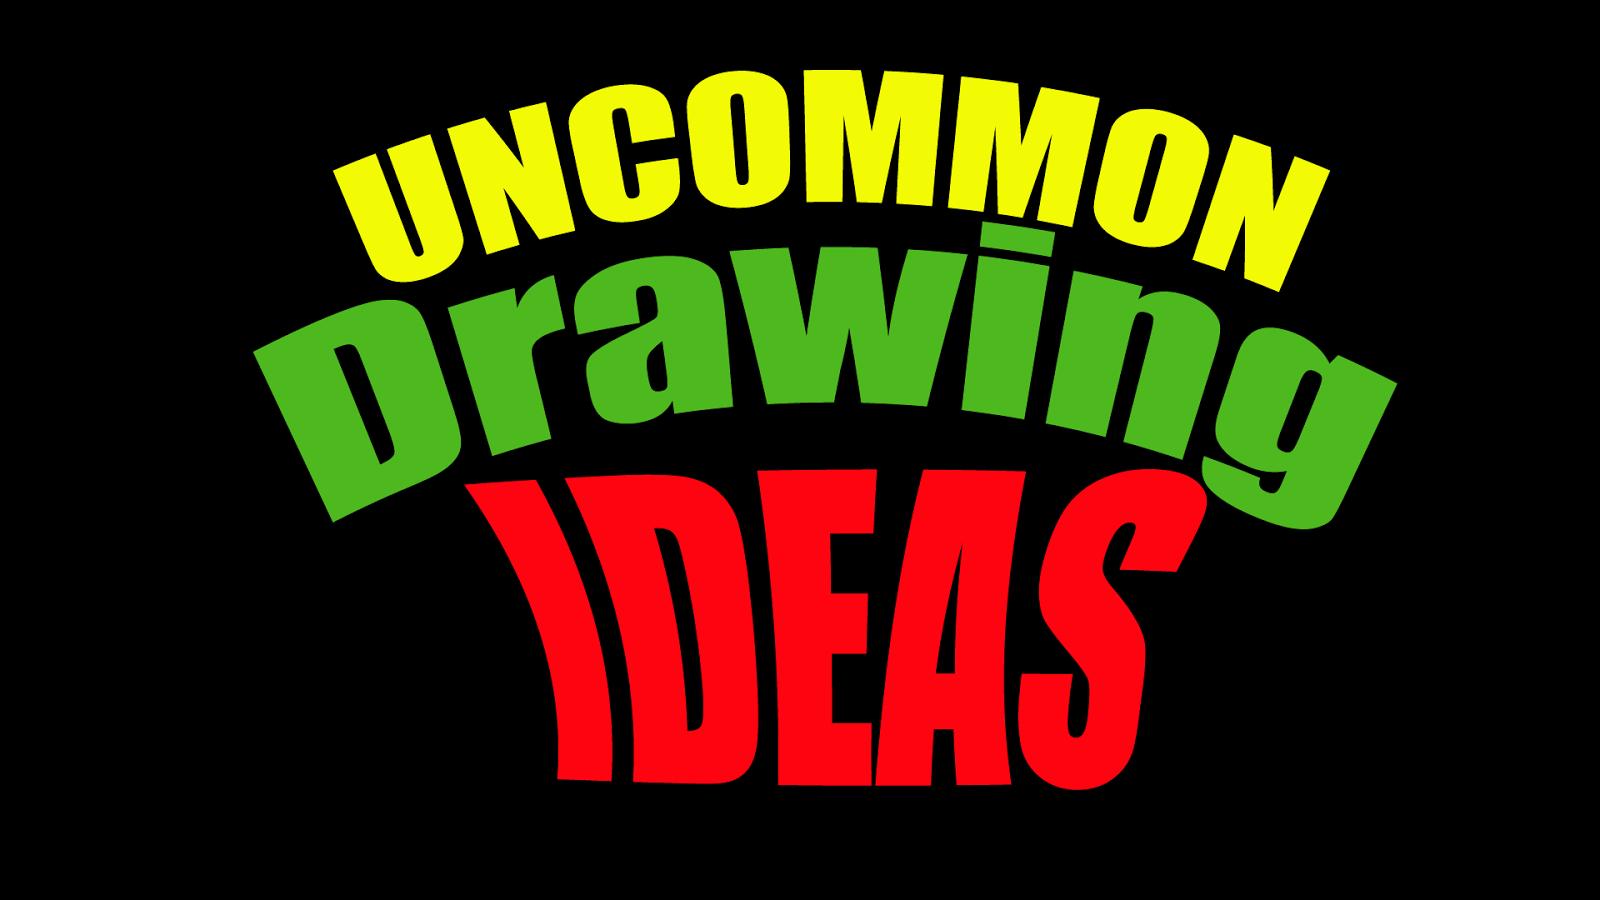 Drawing ideas for kids 167 weird drawing ideas students for Weird drawing ideas